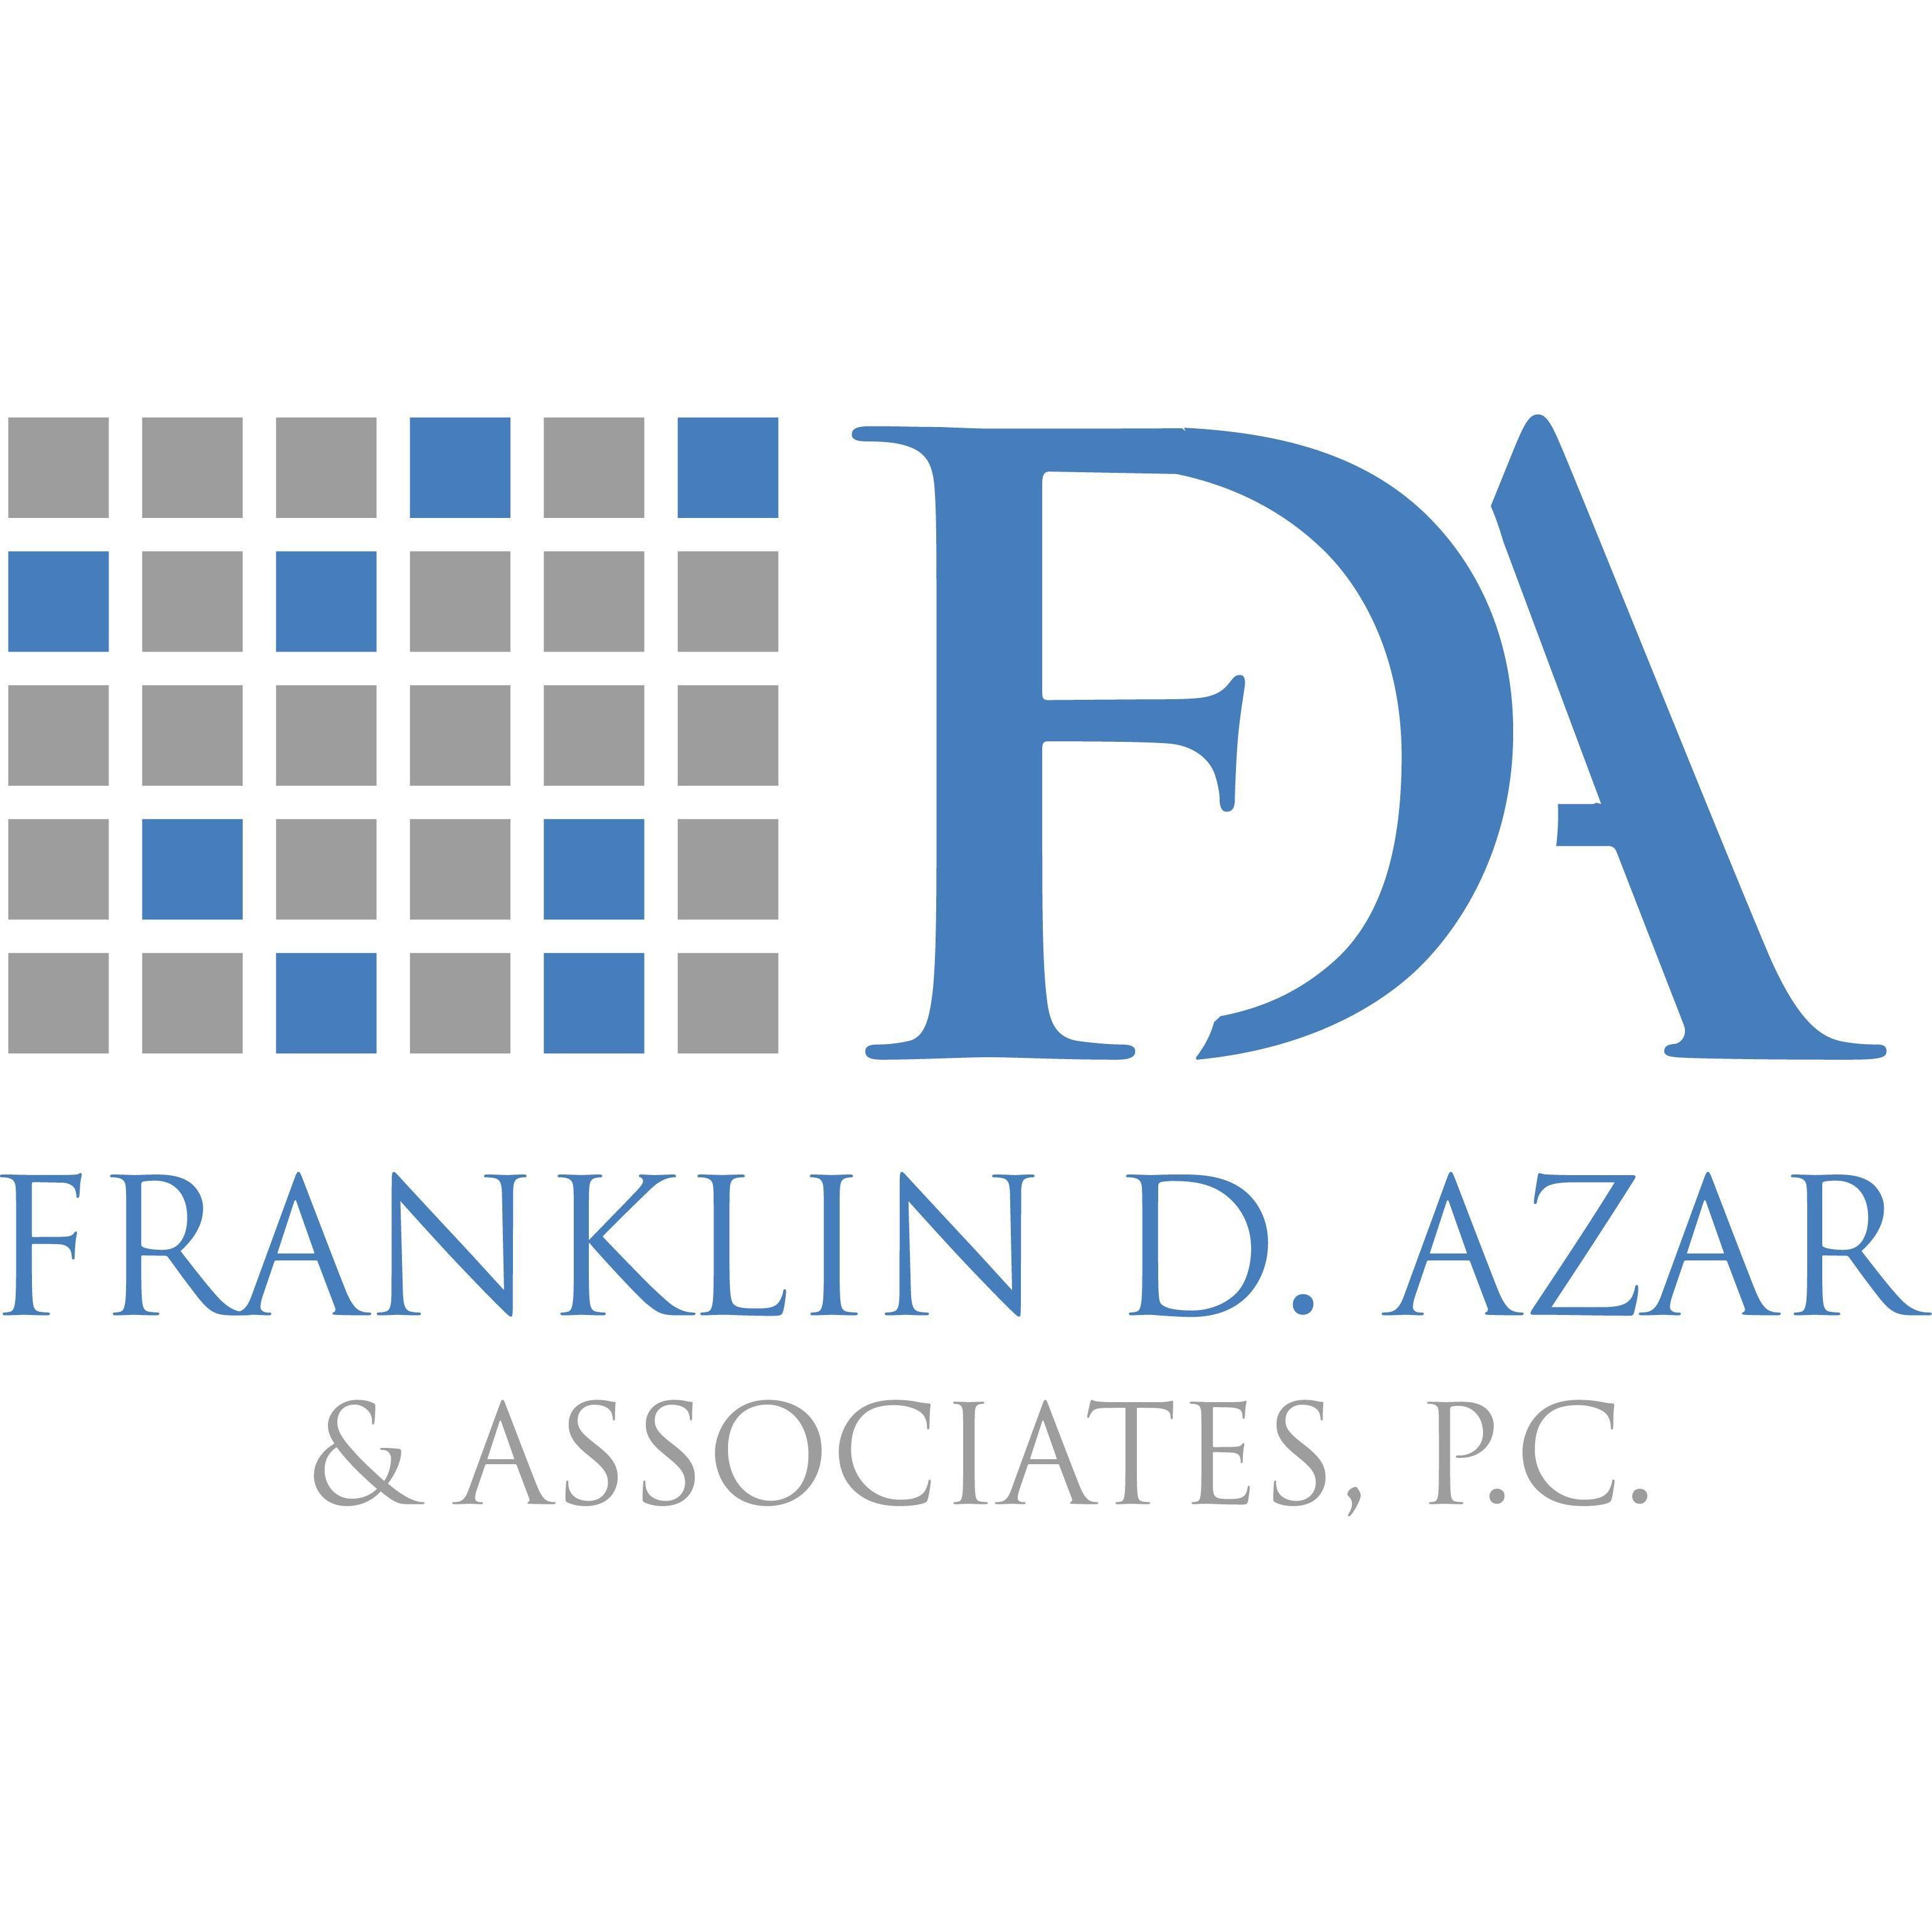 Franklin D. Azar & Associates, P.C. - Pueblo, CO 81003 - (719)299-3889 | ShowMeLocal.com